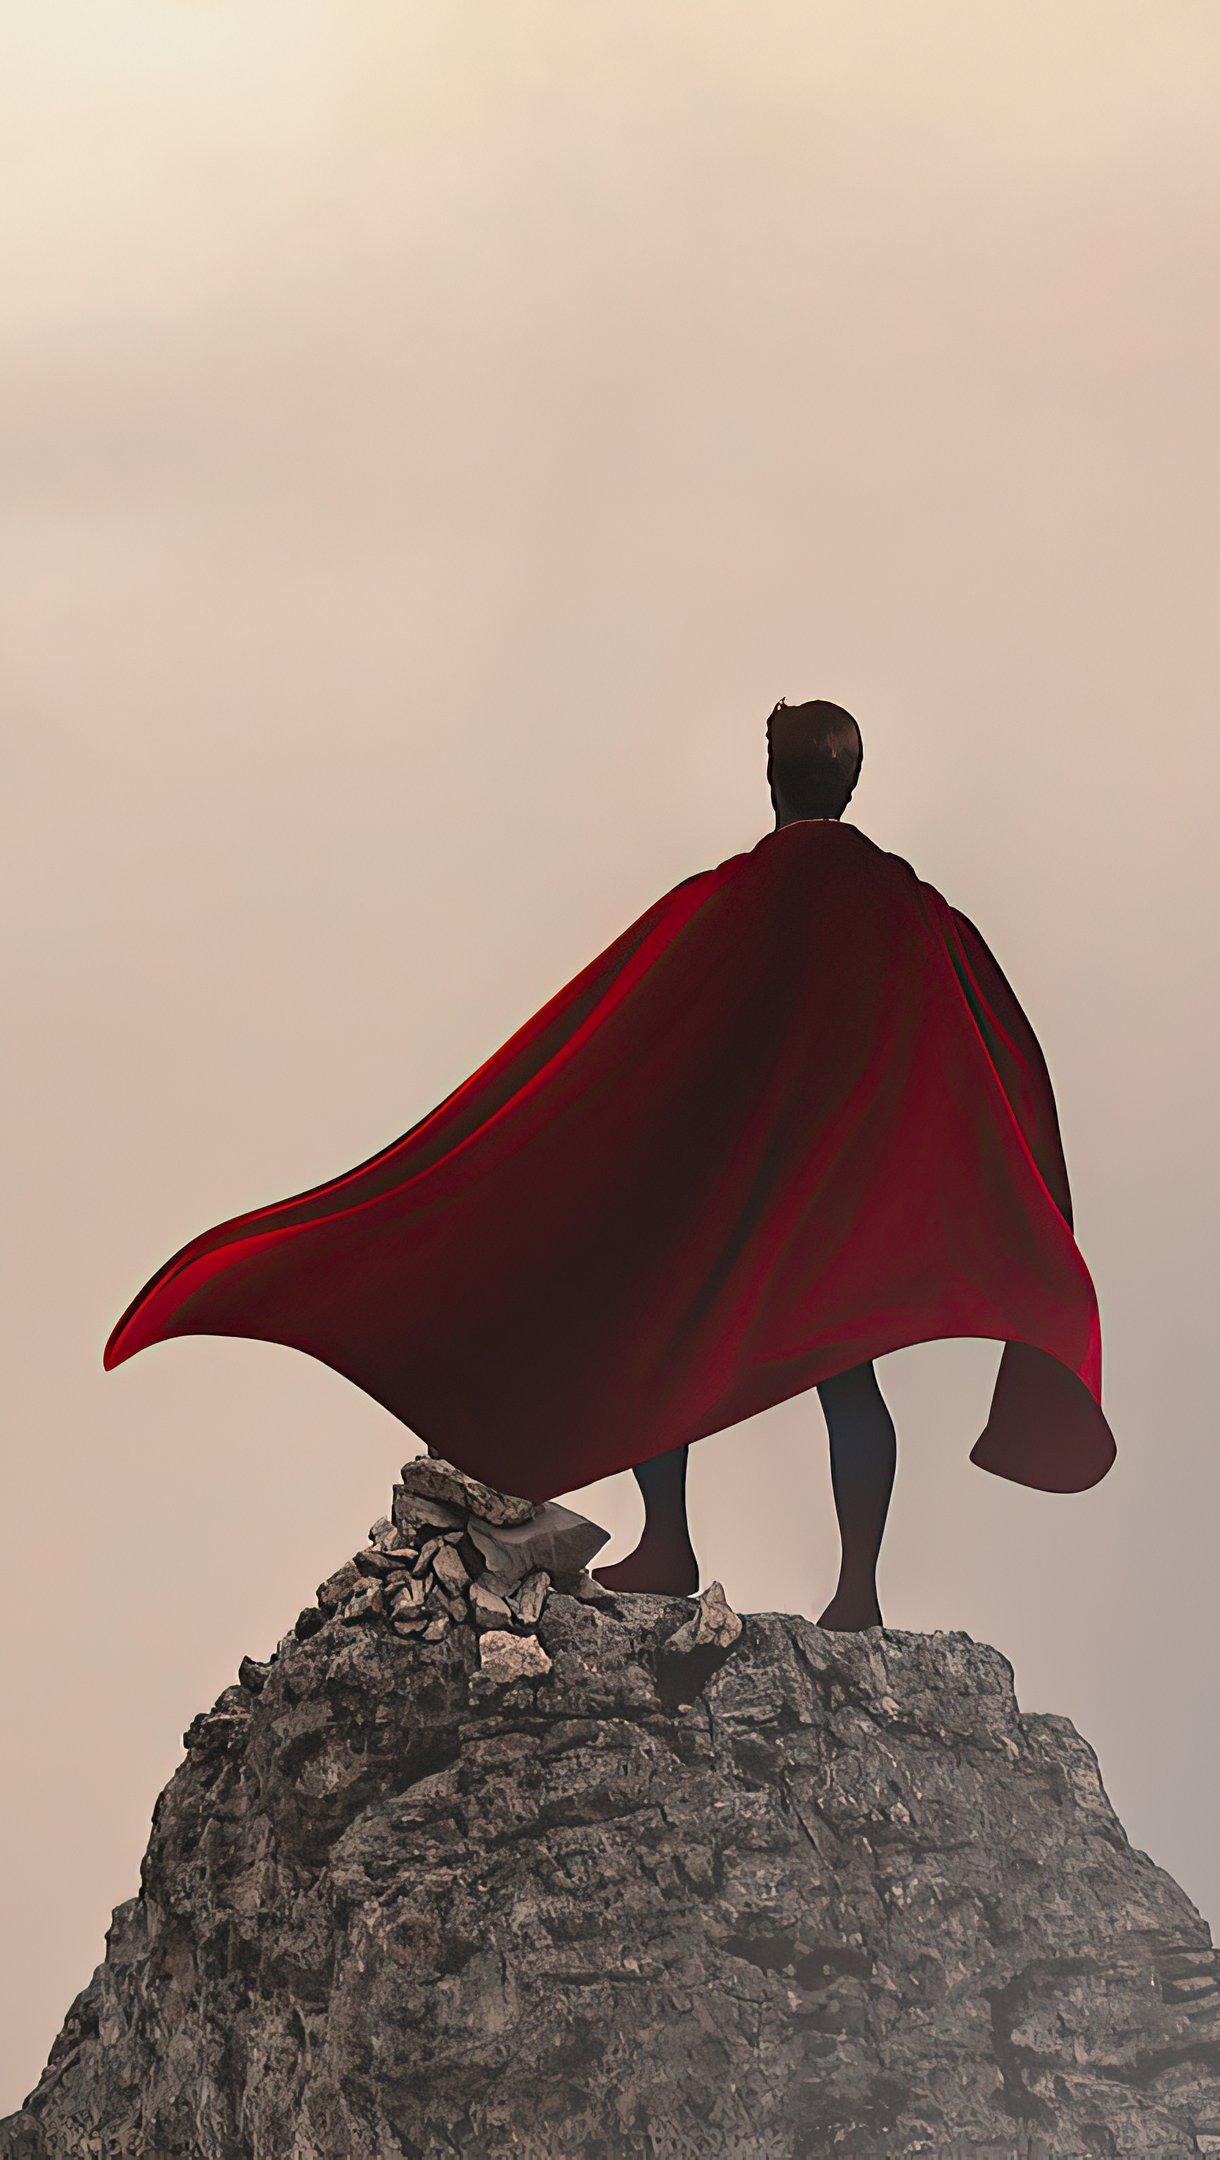 Wallpaper Superman over mountain infront of mist Vertical